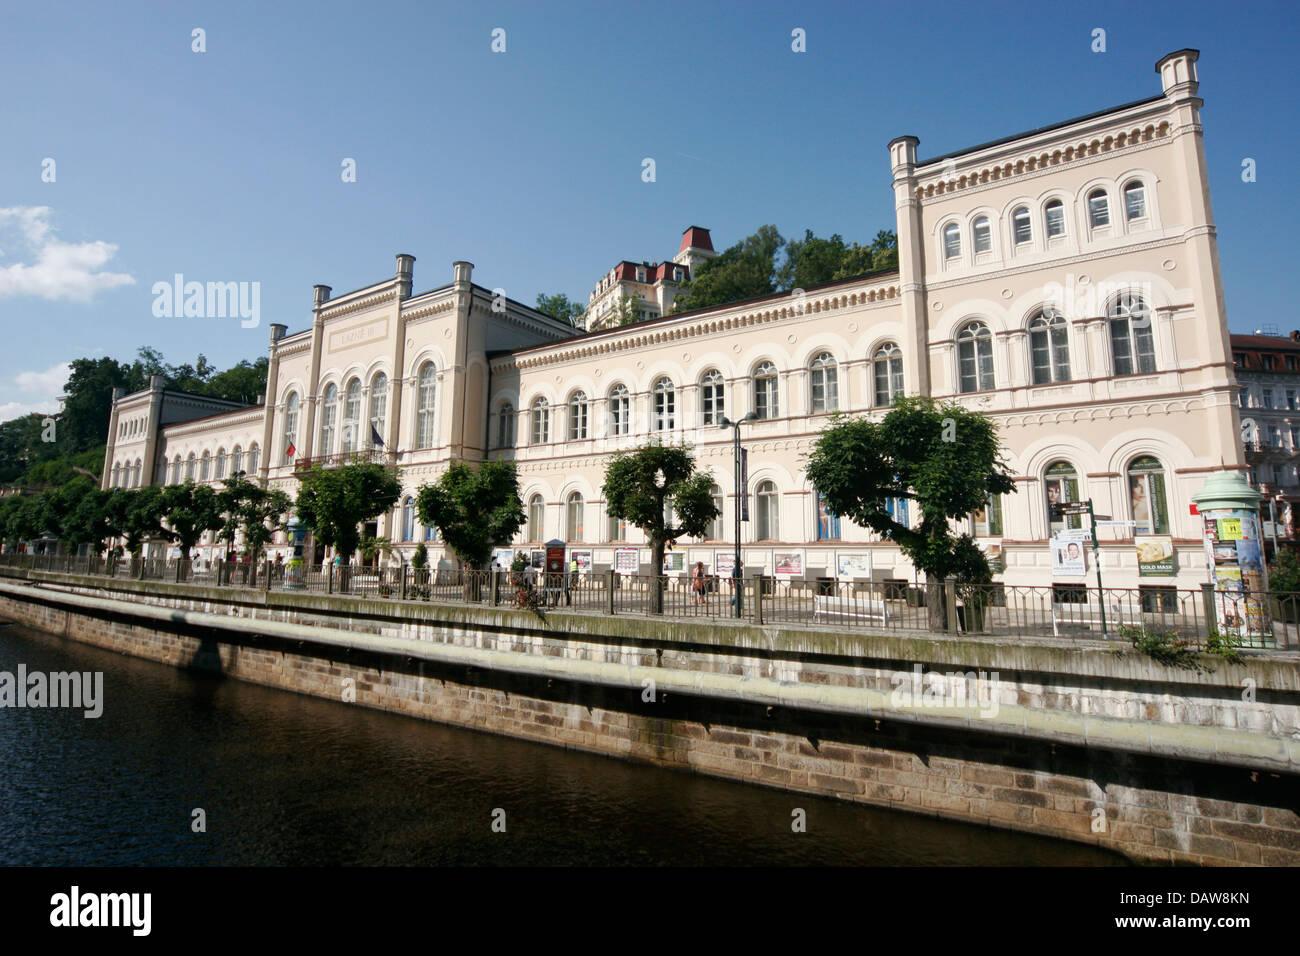 Lazne III on the bank of river Tepla, Karlovy Vary, Czech Republic - Stock Image